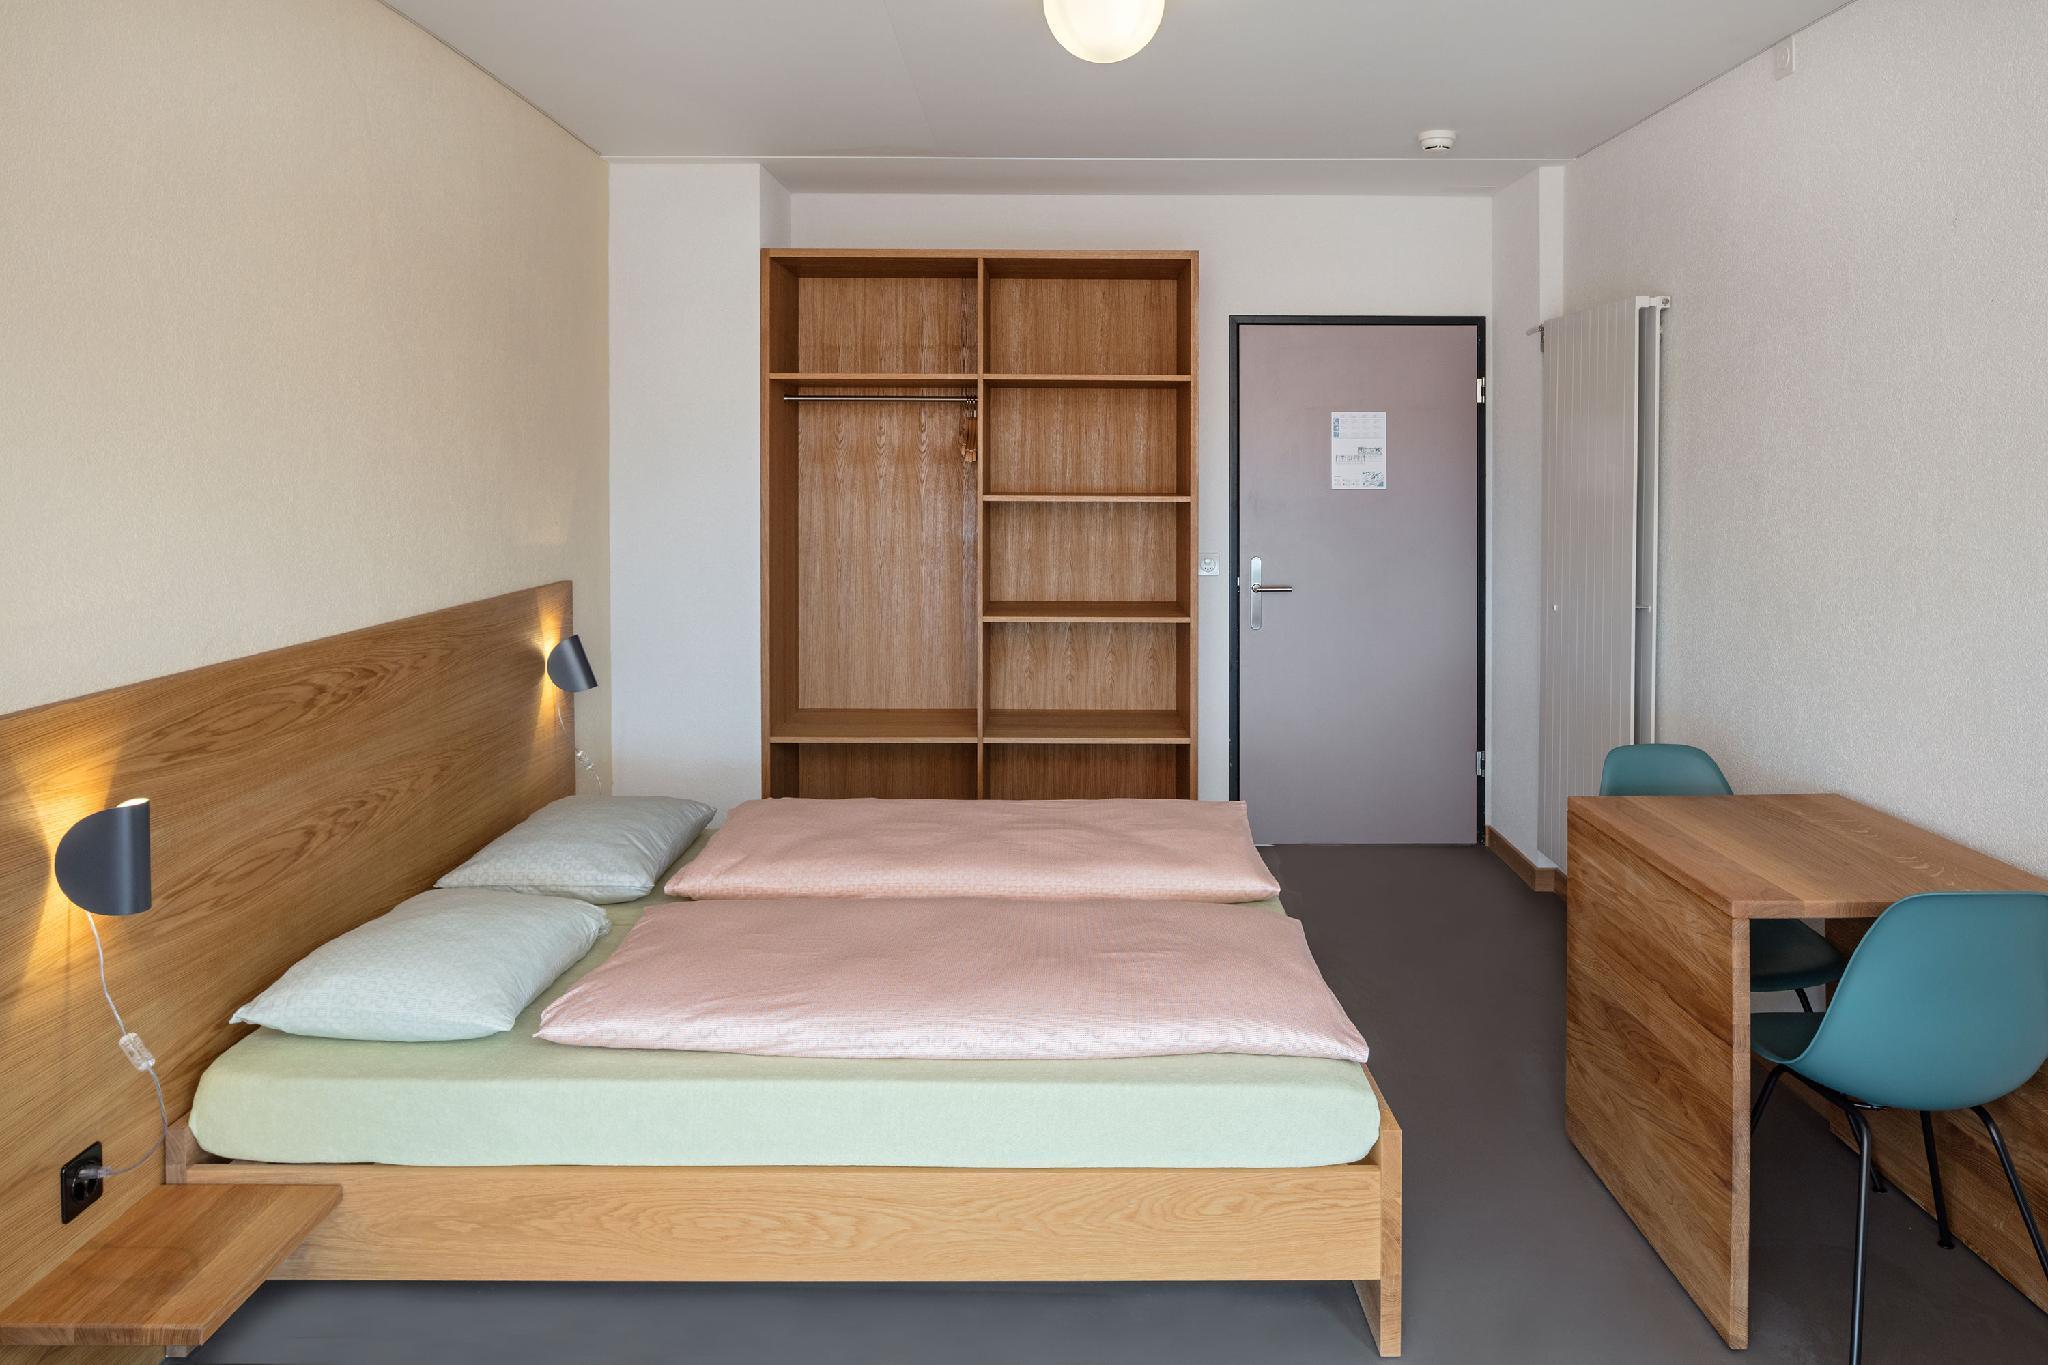 Crans Montana Youth Hostel